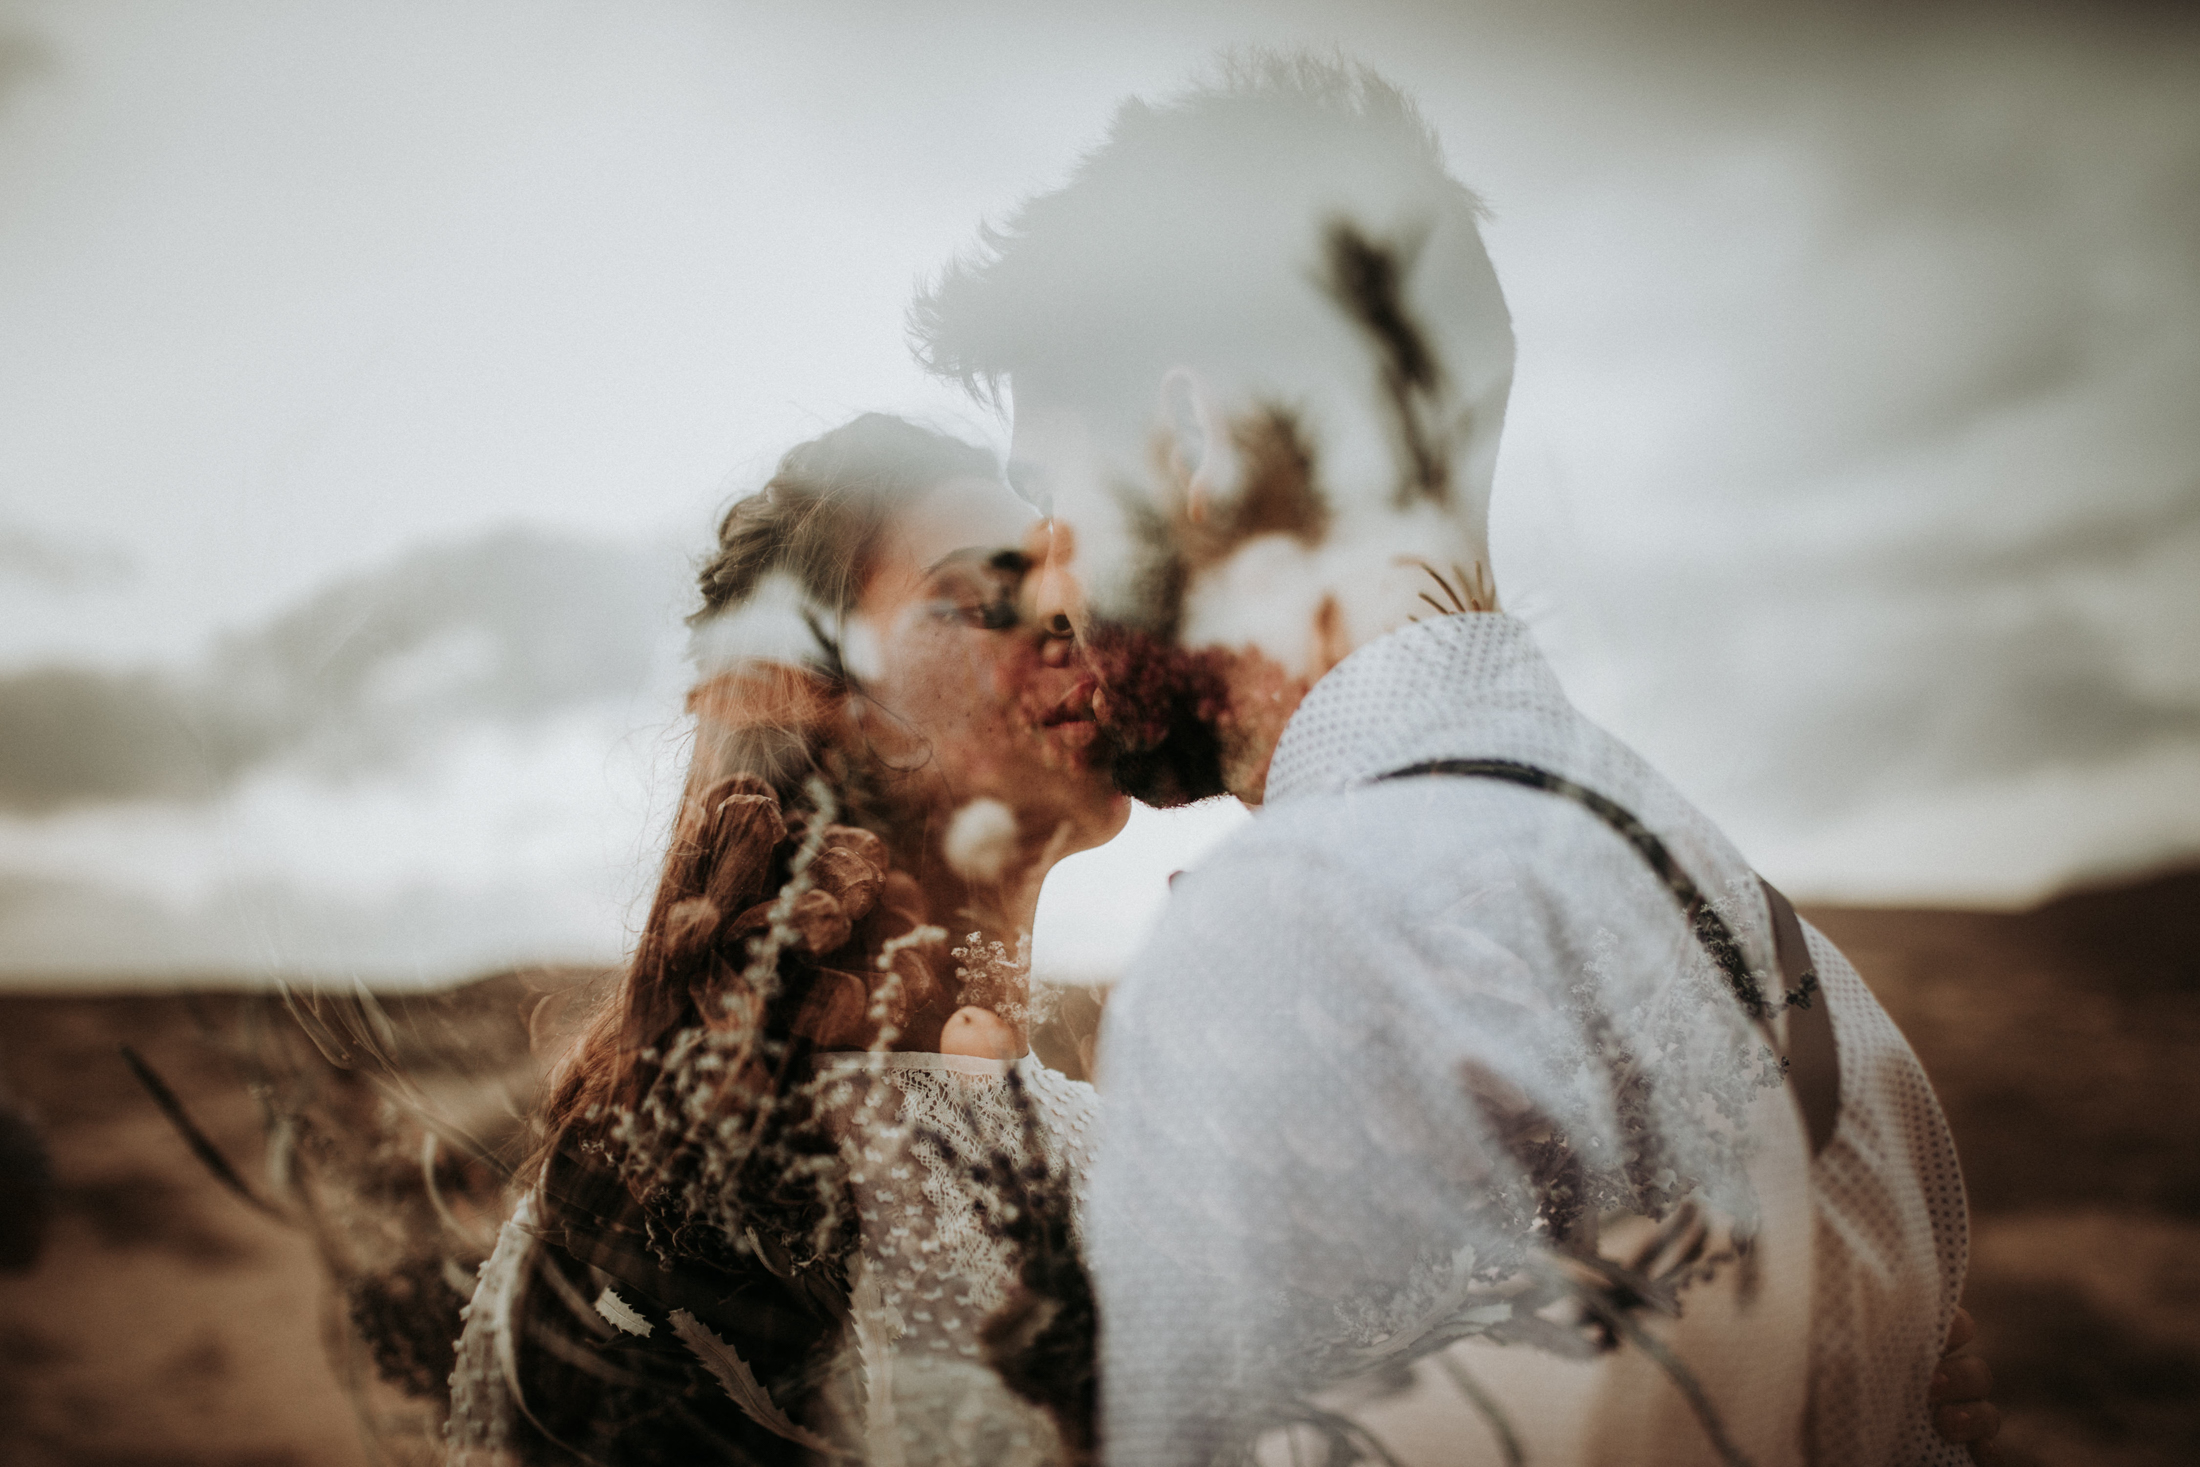 Wedding_Photographer_Mallorca_Daniela-Marquardt_Photography_CanaryIslands_Lanzarote_Iceland_Tuskany_Santorini_Portugal_Schweiz_Austria_Bayern_Elopement_Hochzeitsfotograf_34